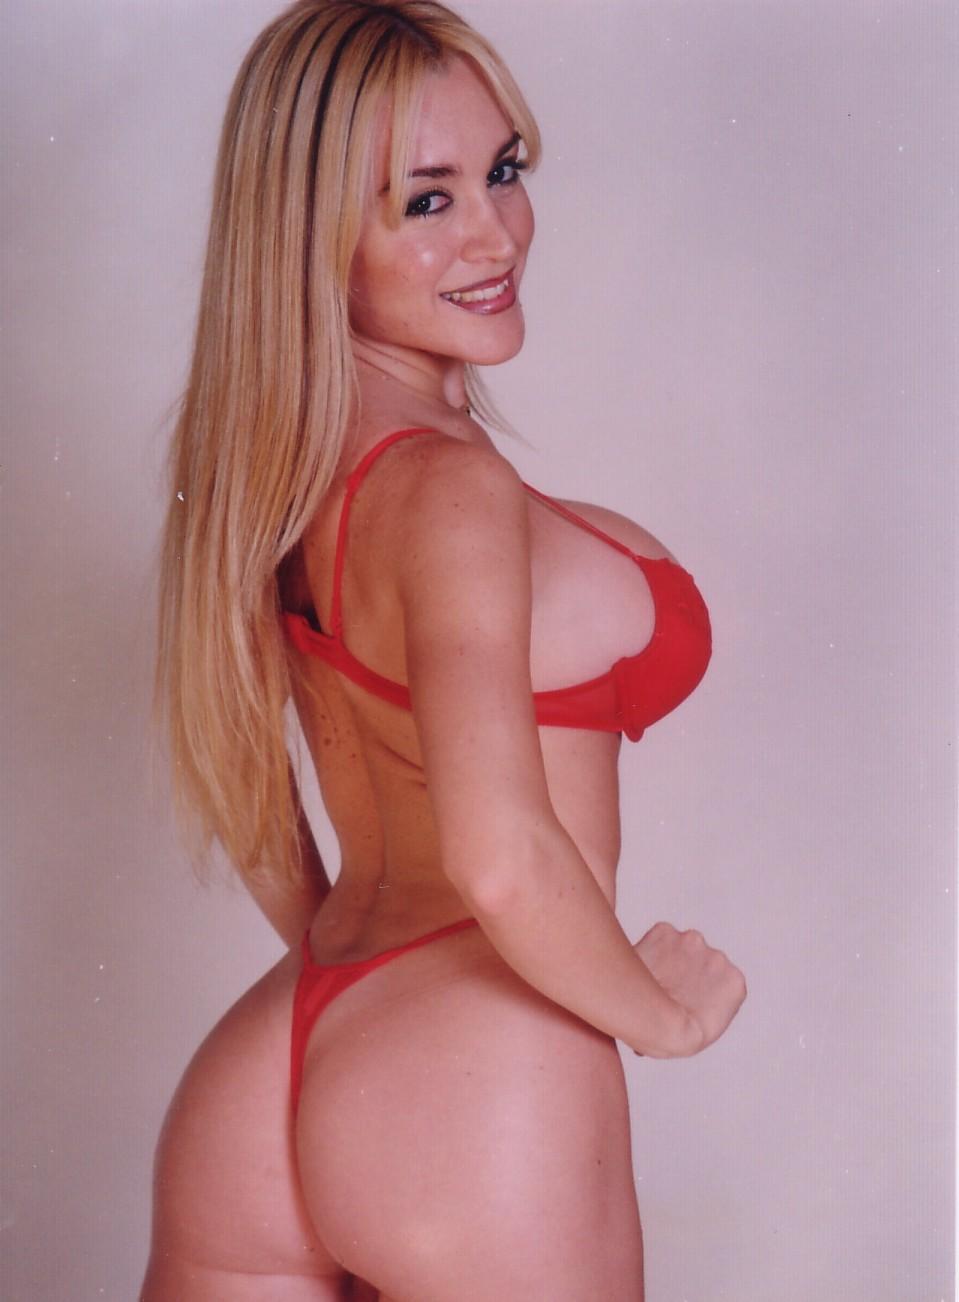 http://www.sitiosargentina.com.ar/fotos/mujeres/fotos/f/Fatima%20(35).jpg